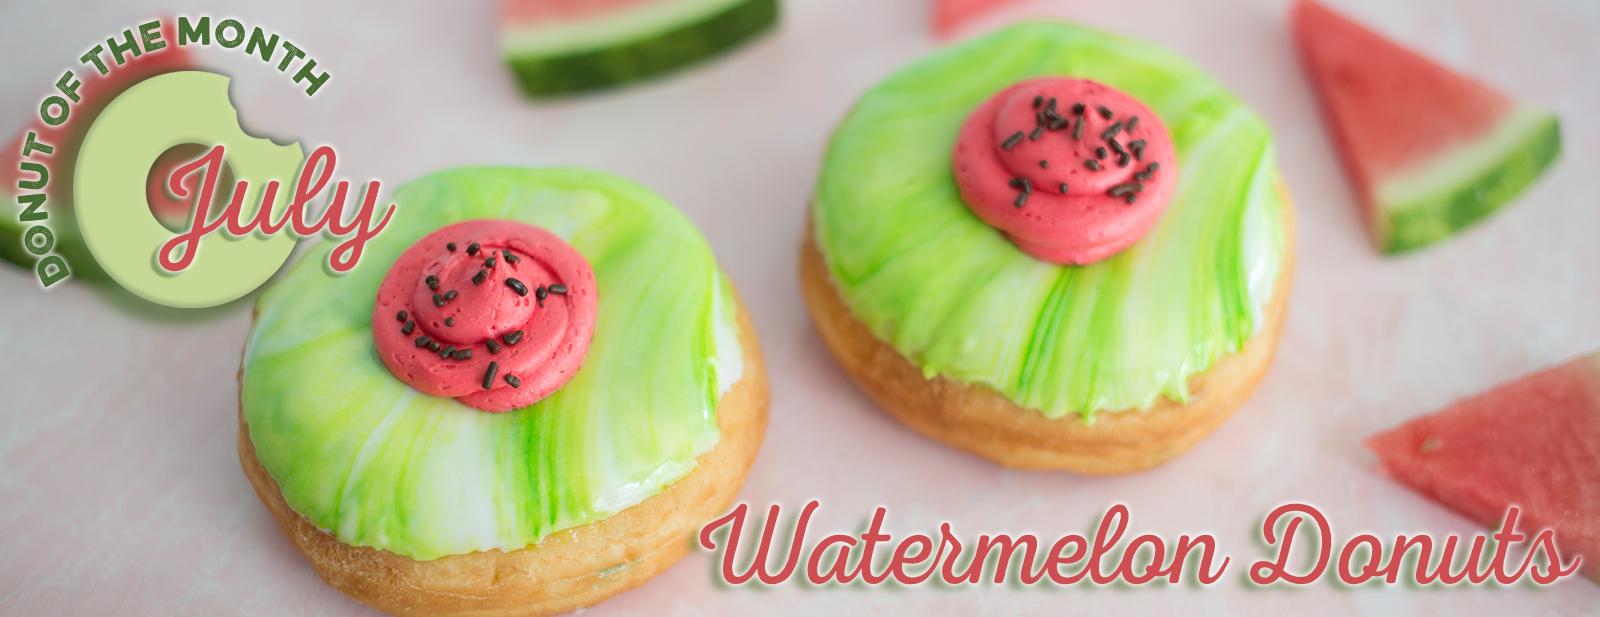 Watermelon Donut